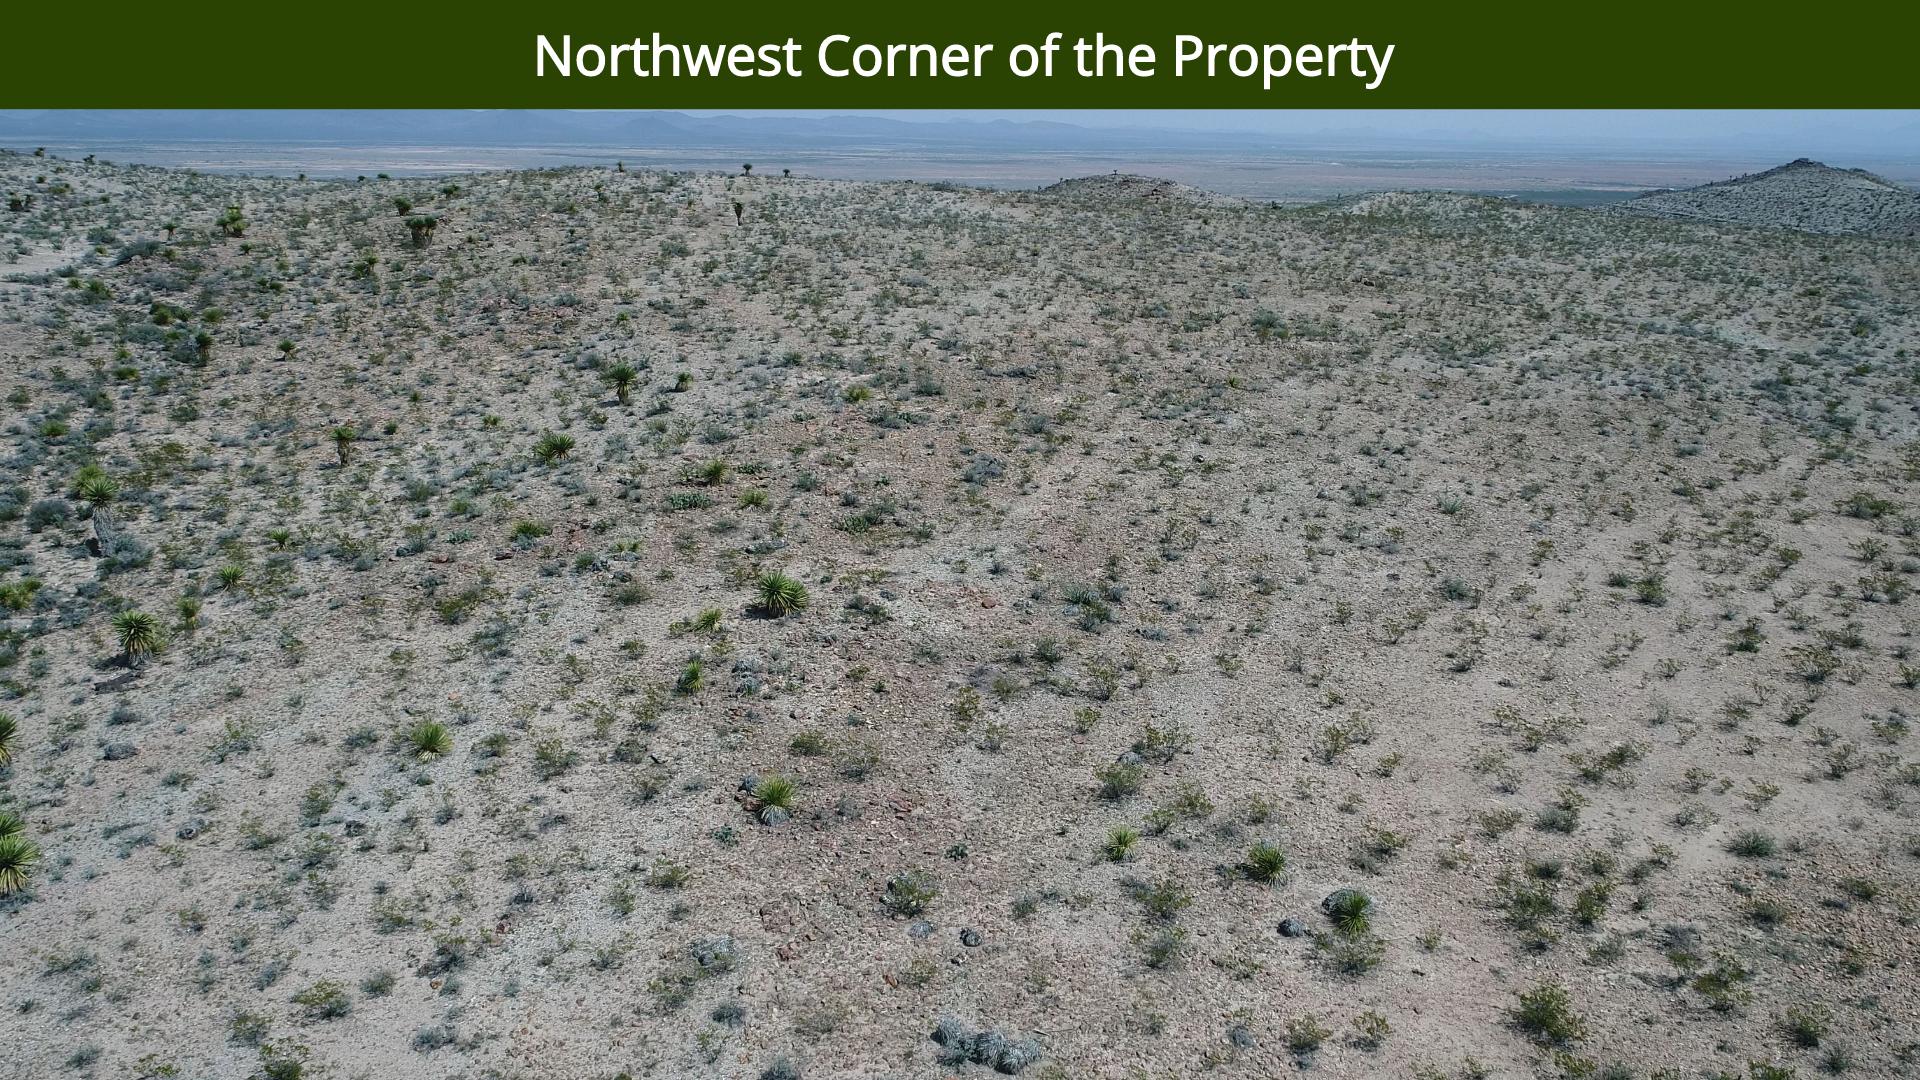 Northwest Corner of the Property